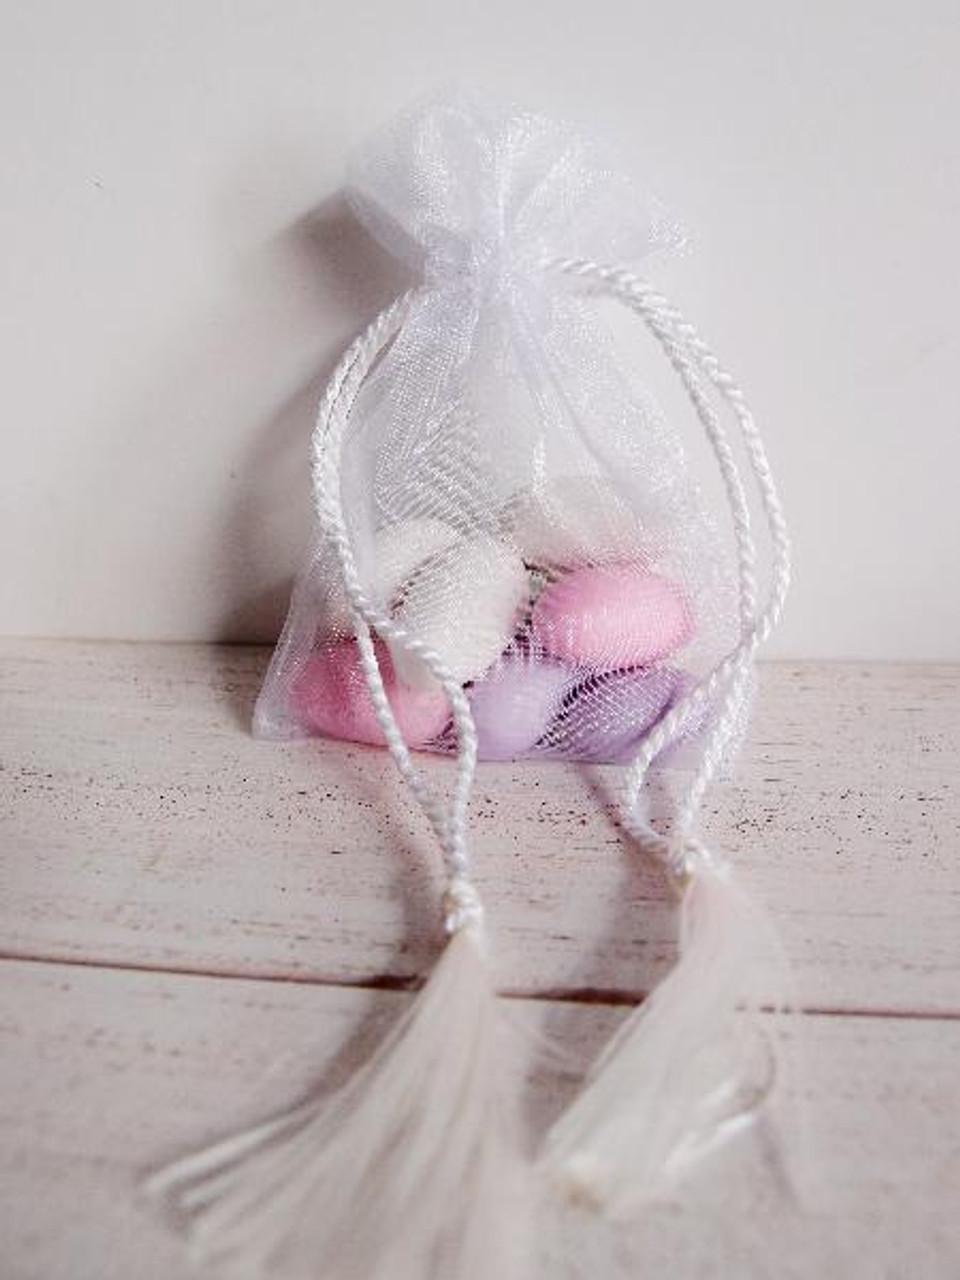 White Organza Bag with Tassel Drawstring (3 sizes)